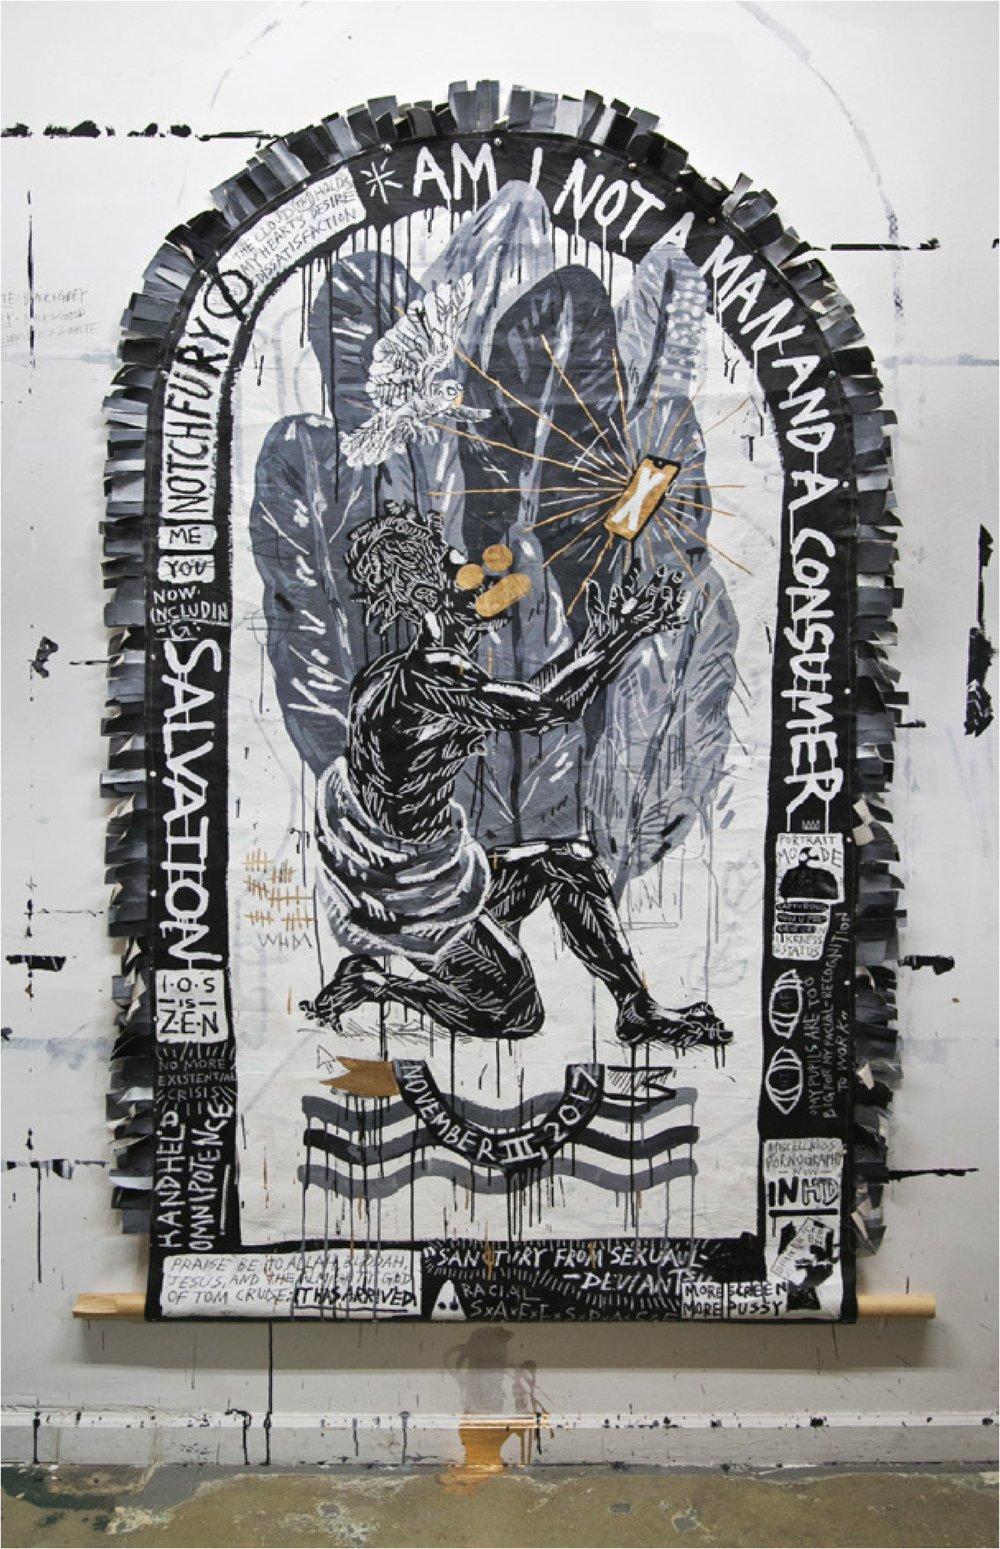 Studio View: ' The Ascension' , studio view Louis De Villiers, 2018 Brooklyn, NY.